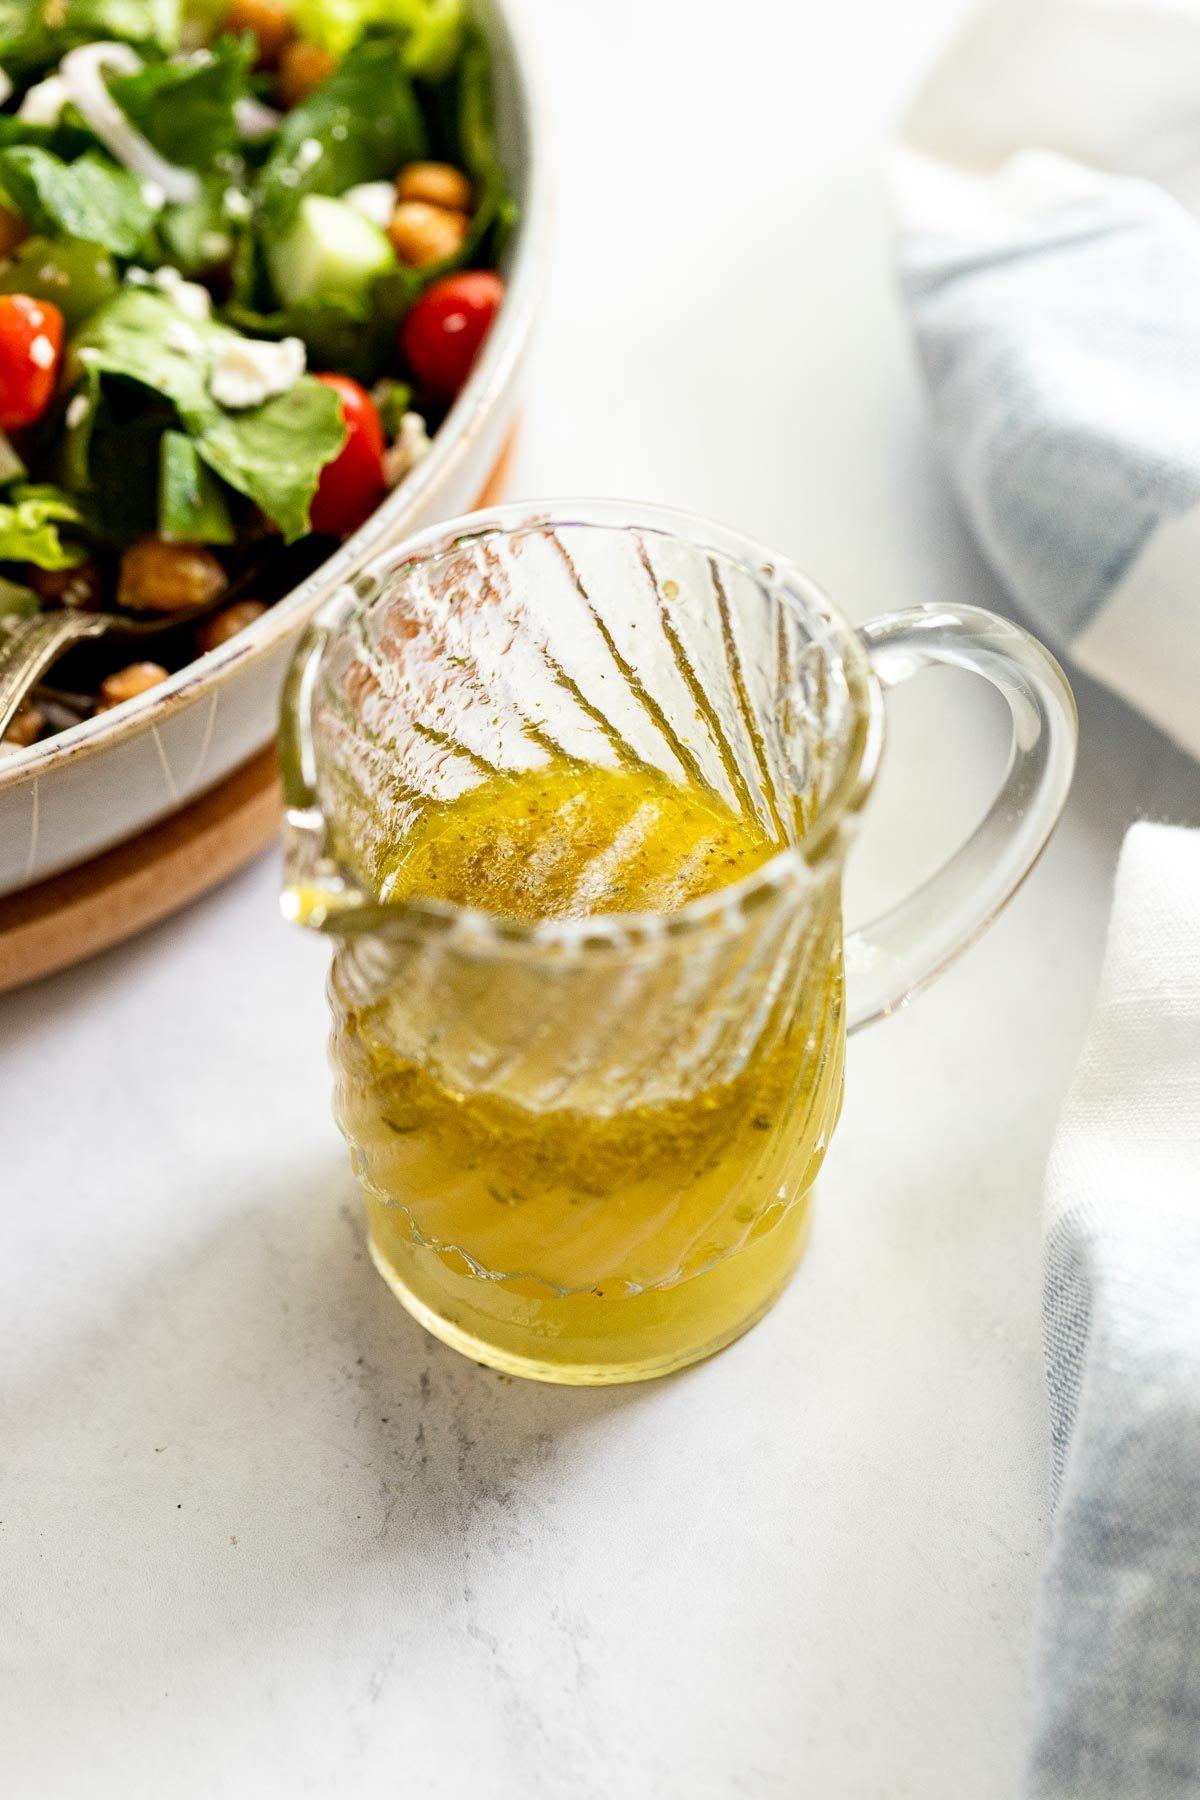 Jar of dressing next to a salad.